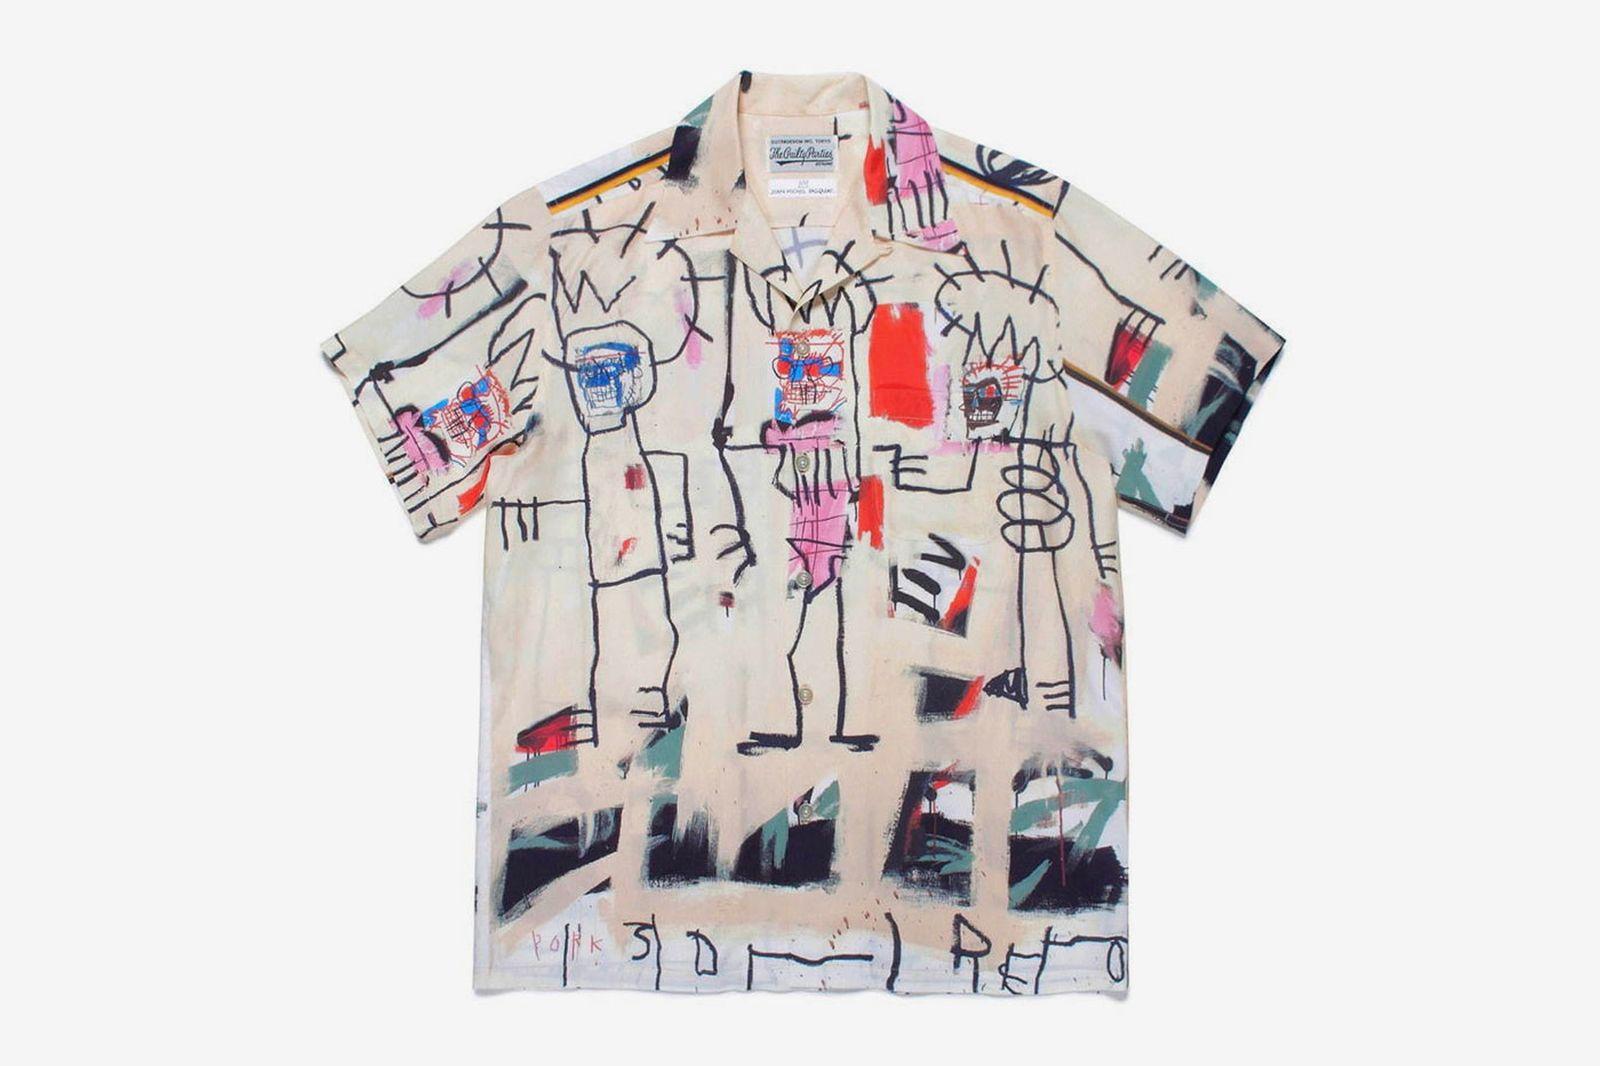 HS-jean-michel-basquiat-x-wacko-maria-hawaiian-shirt-info-003